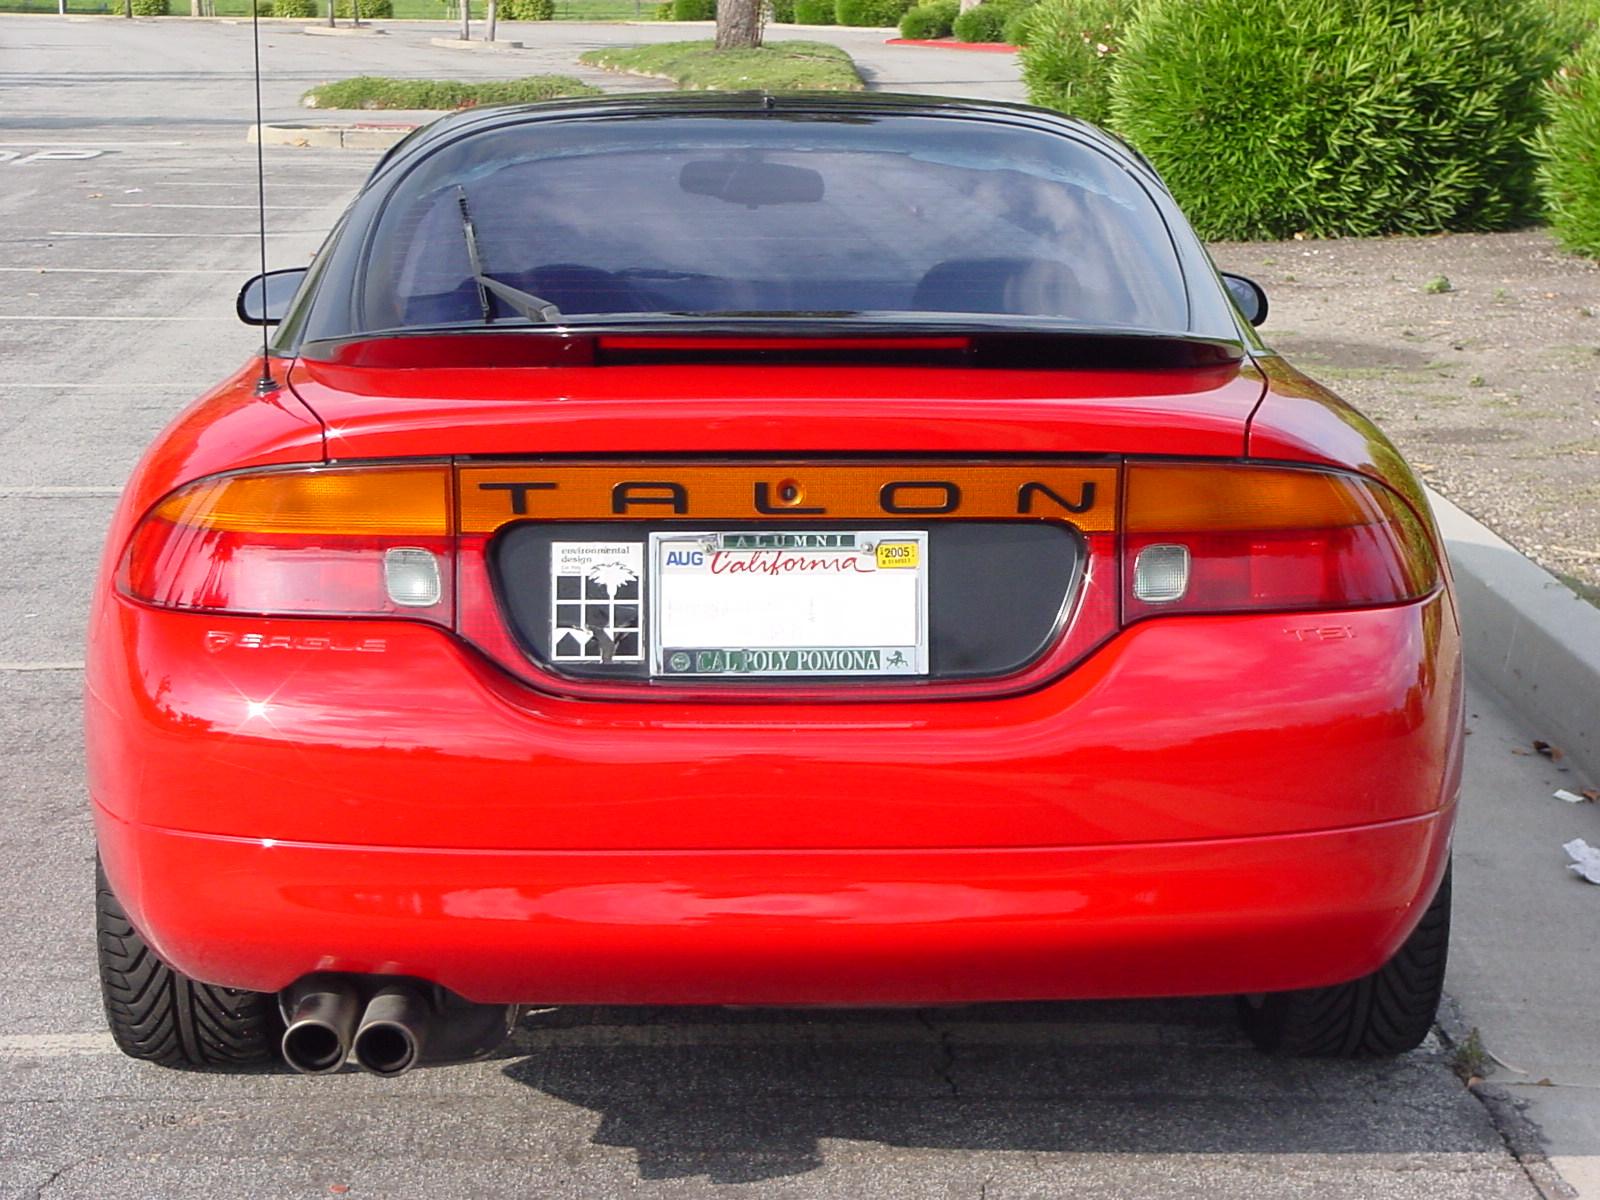 ... Chrysler Eagle Talon Liftback 1998 ...